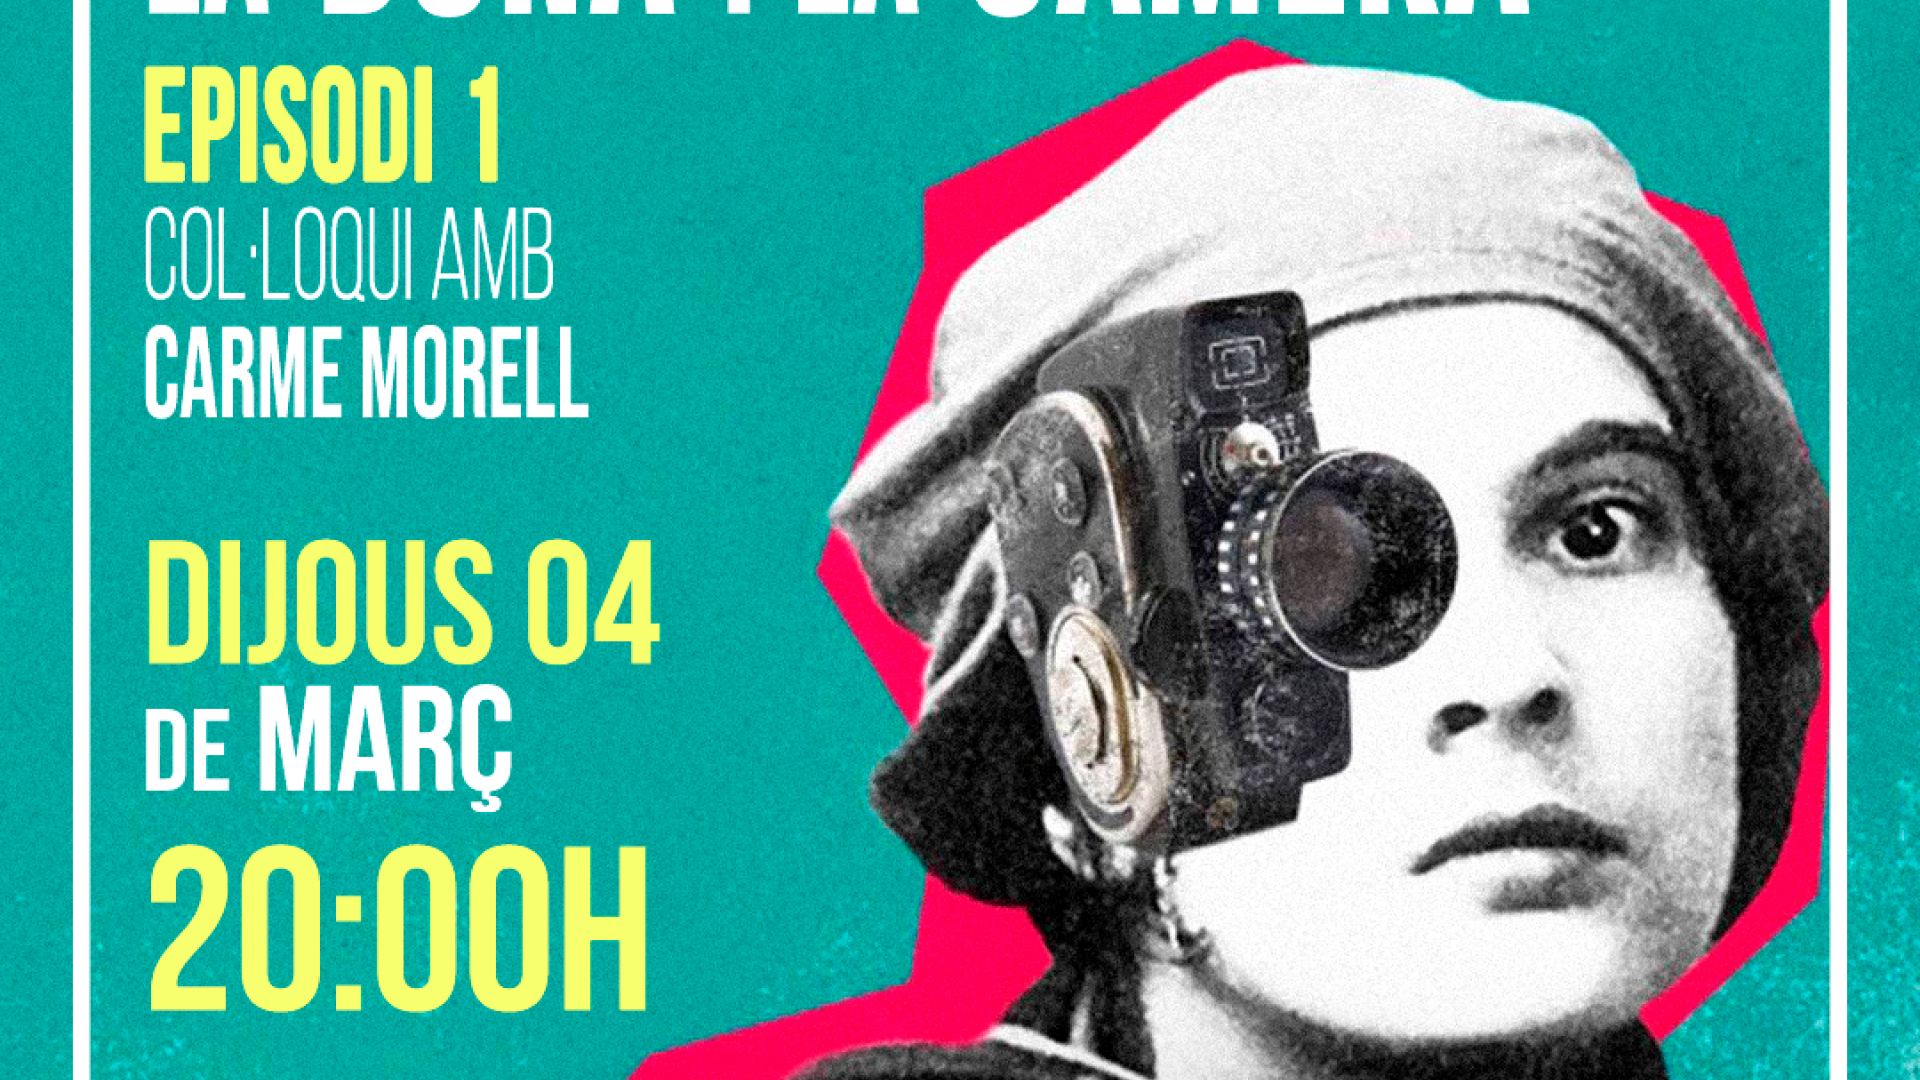 La dona i la càmera: Women make film with Carme Morell